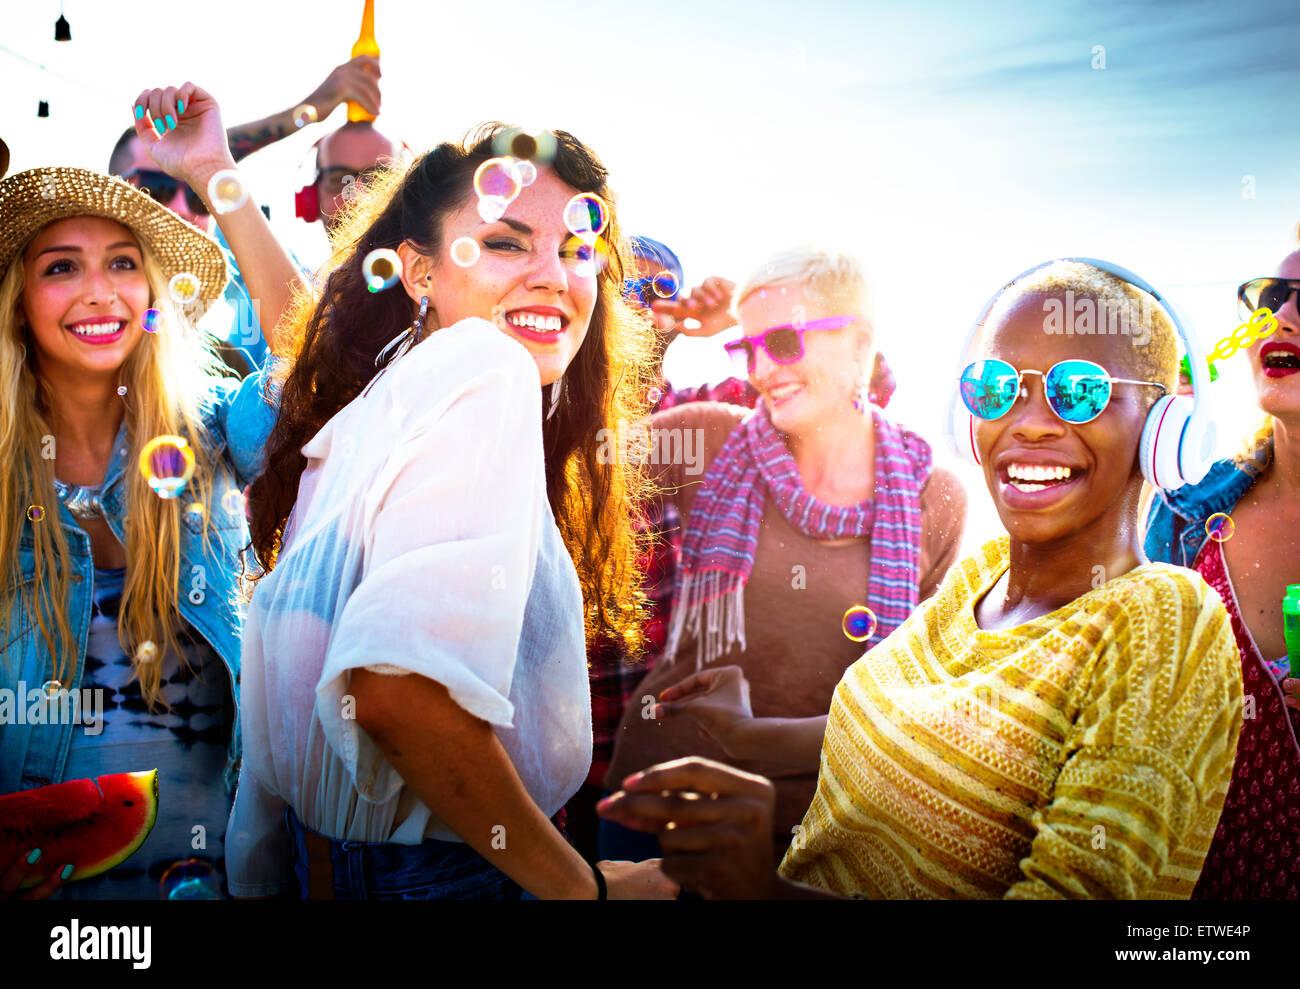 Diversity Dancing Beach Party Celebration Concept - Stock Image